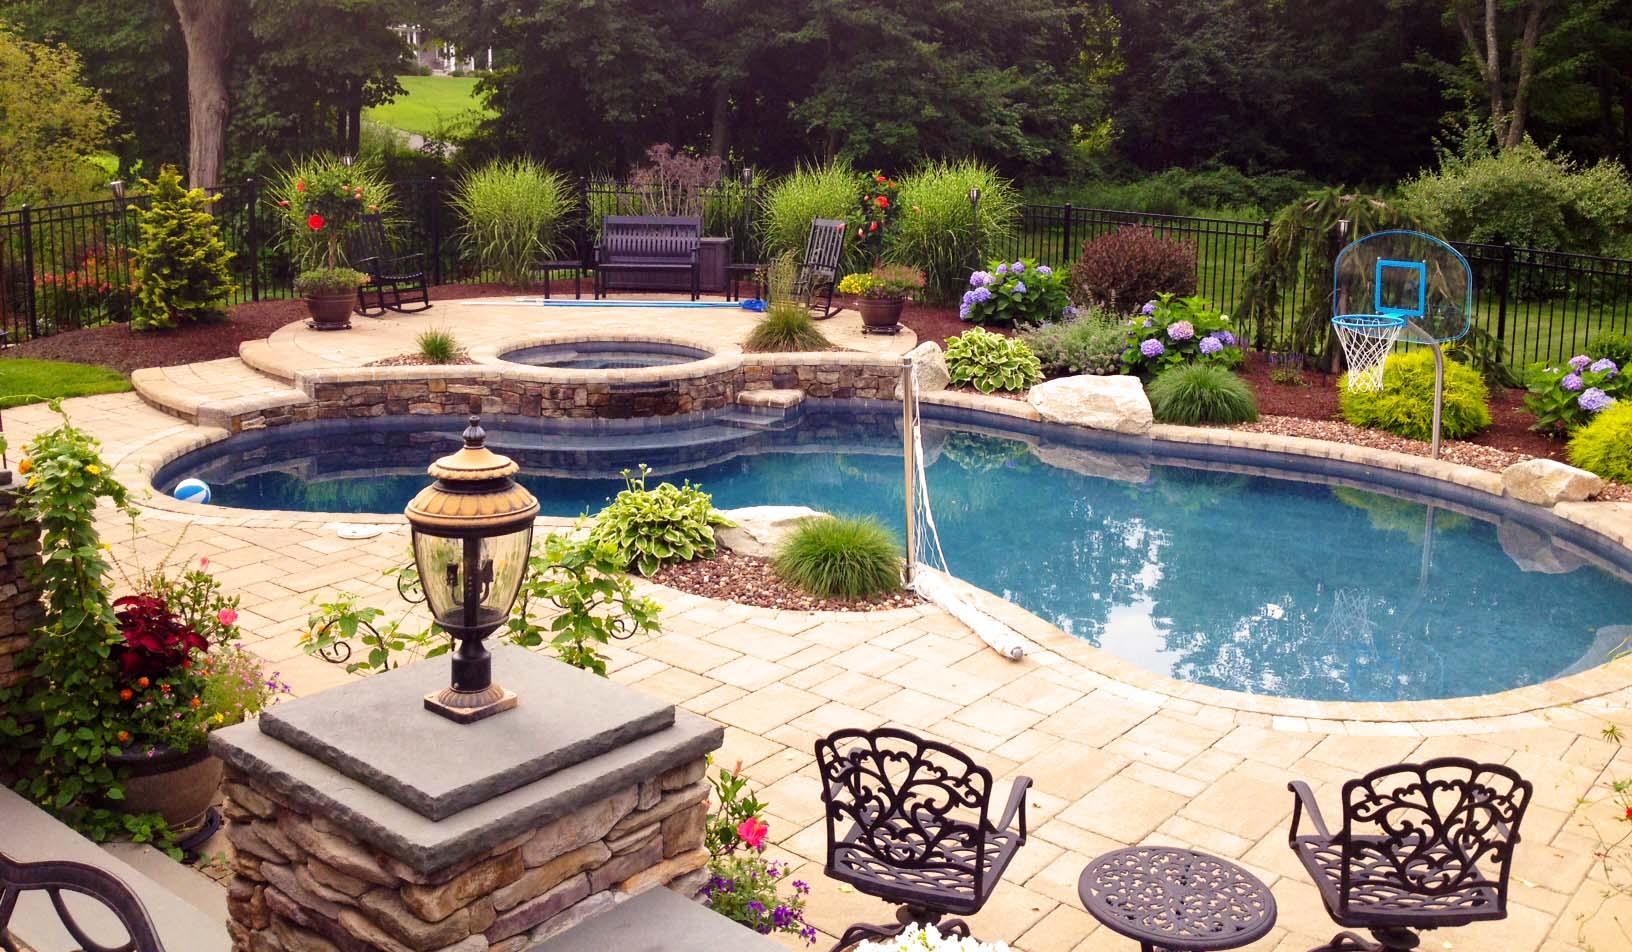 2017 Luxury Backyard Design Trends & 2016 Backyard of the ... on Best Yard Design id=51039